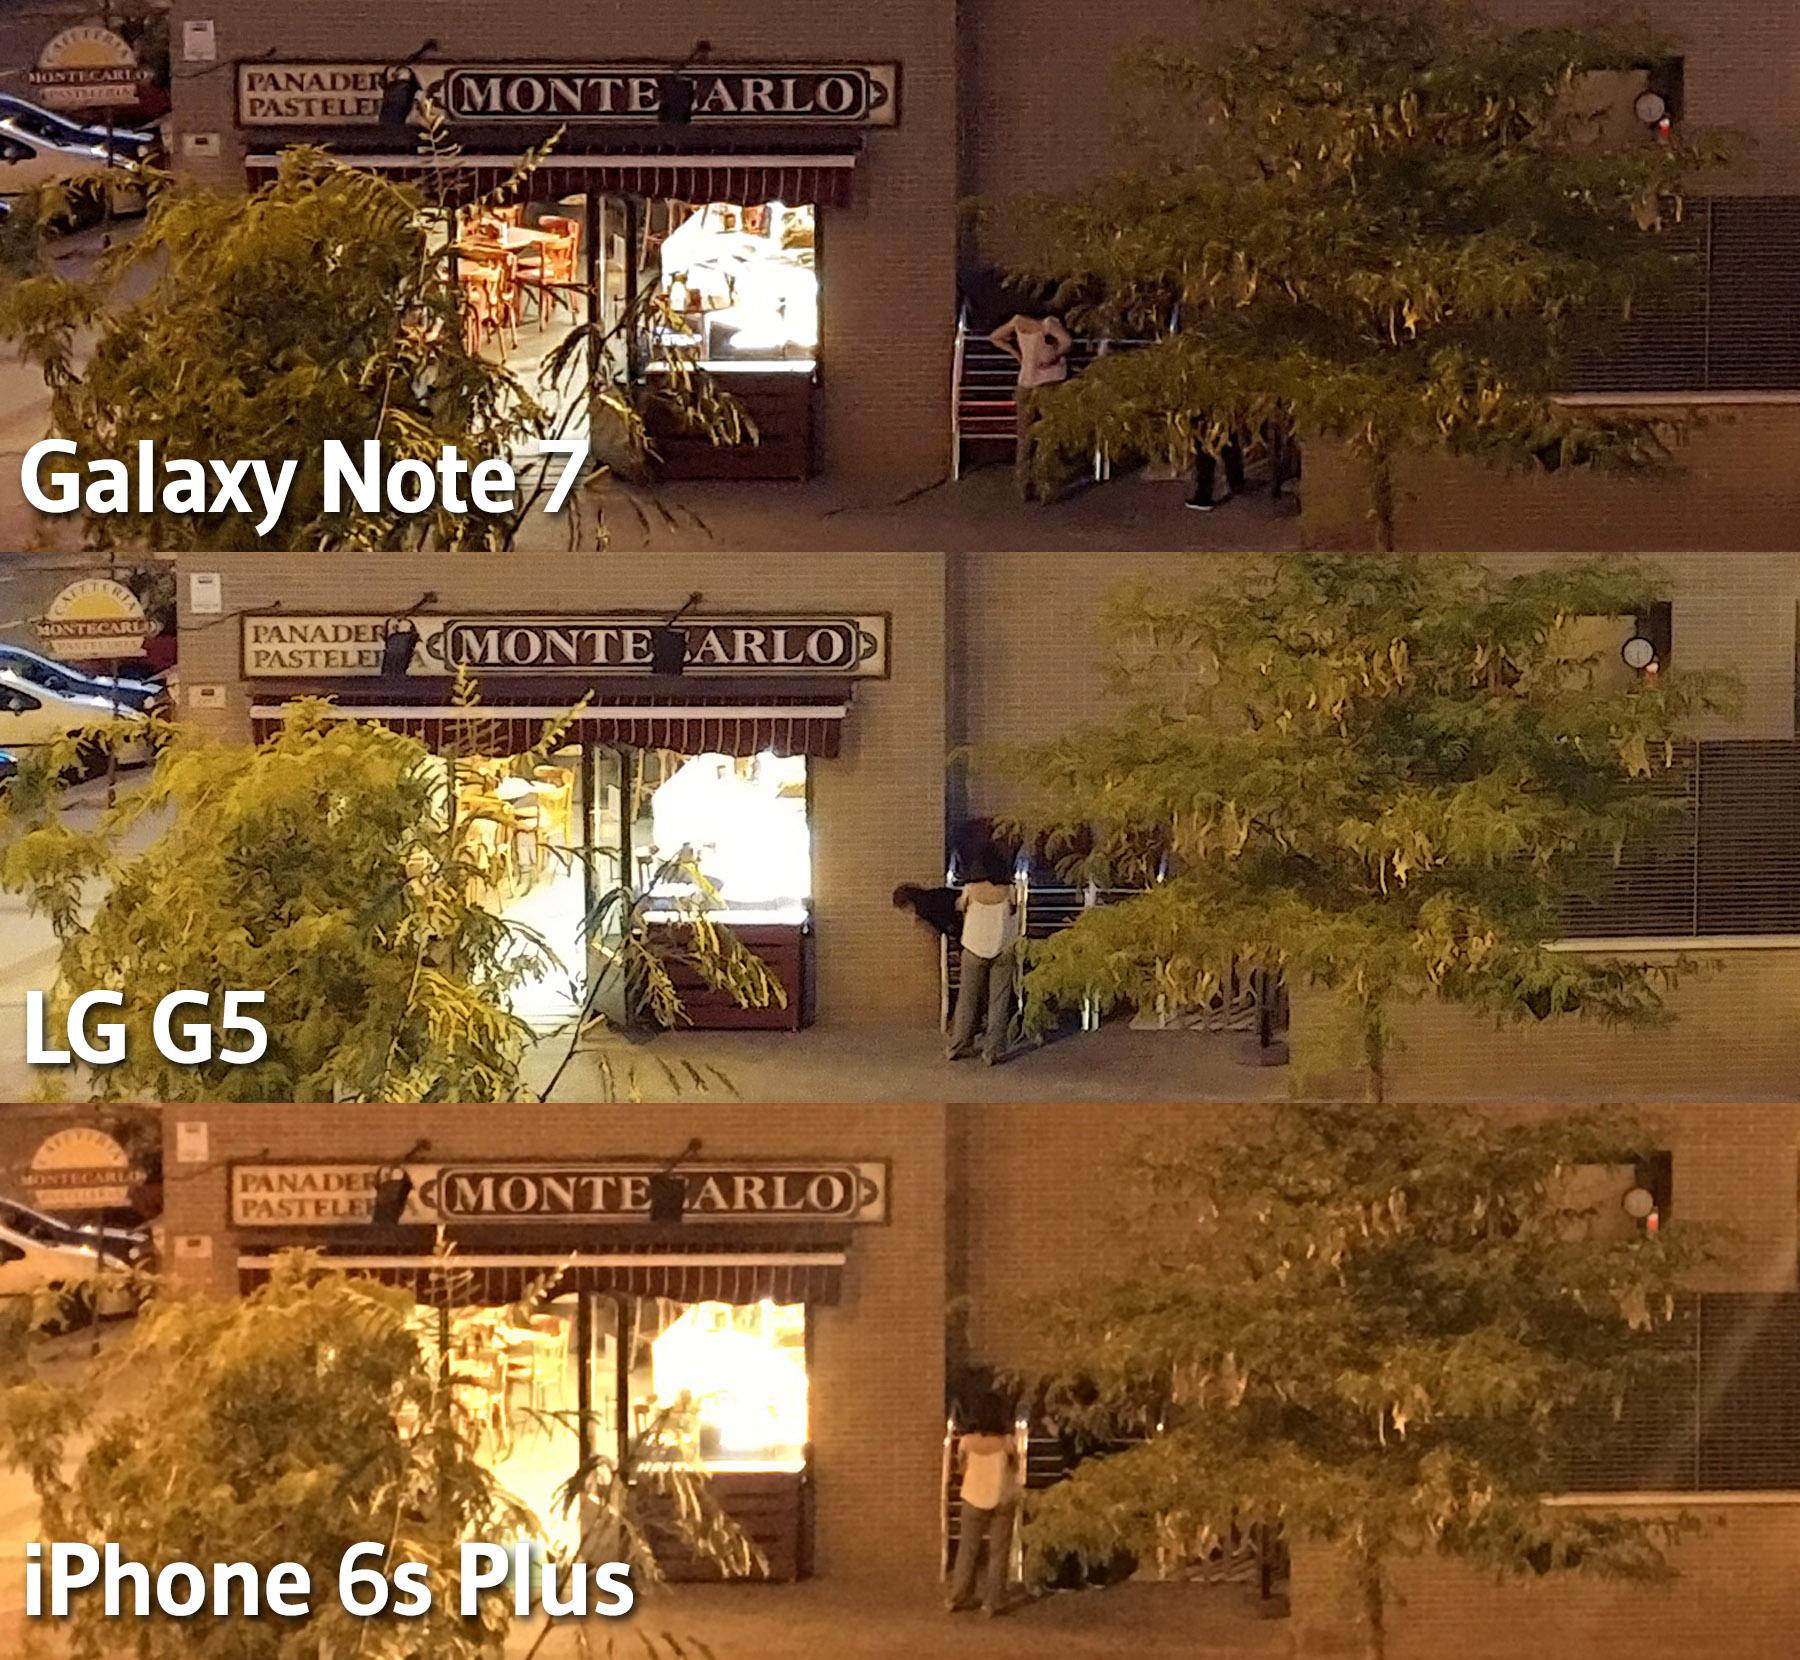 Comparativas fotos noche - Galaxy Note 7 - LG G5 - iPhone 6s Plus